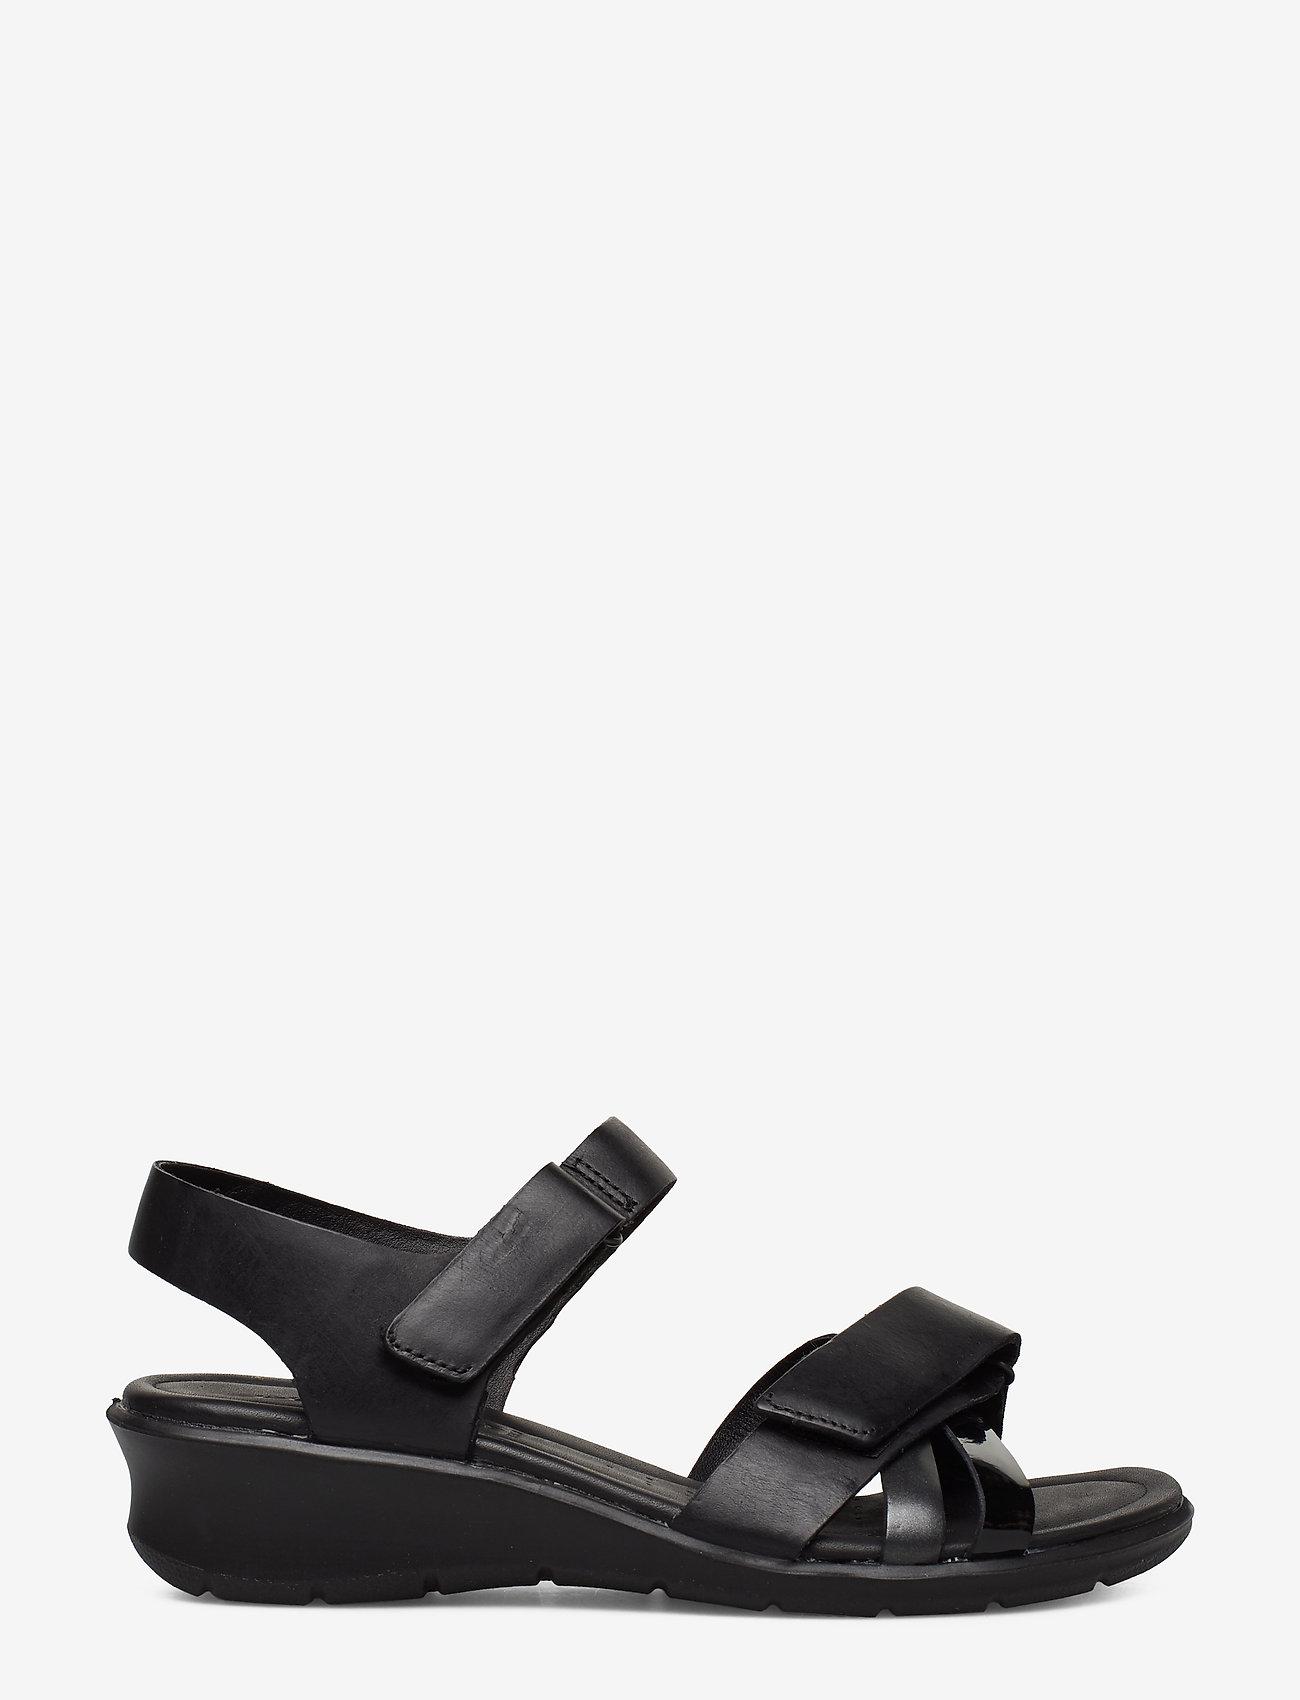 ECCO - FELICIA SANDAL - flat sandals - black/black dark shadow metallic/black - 1